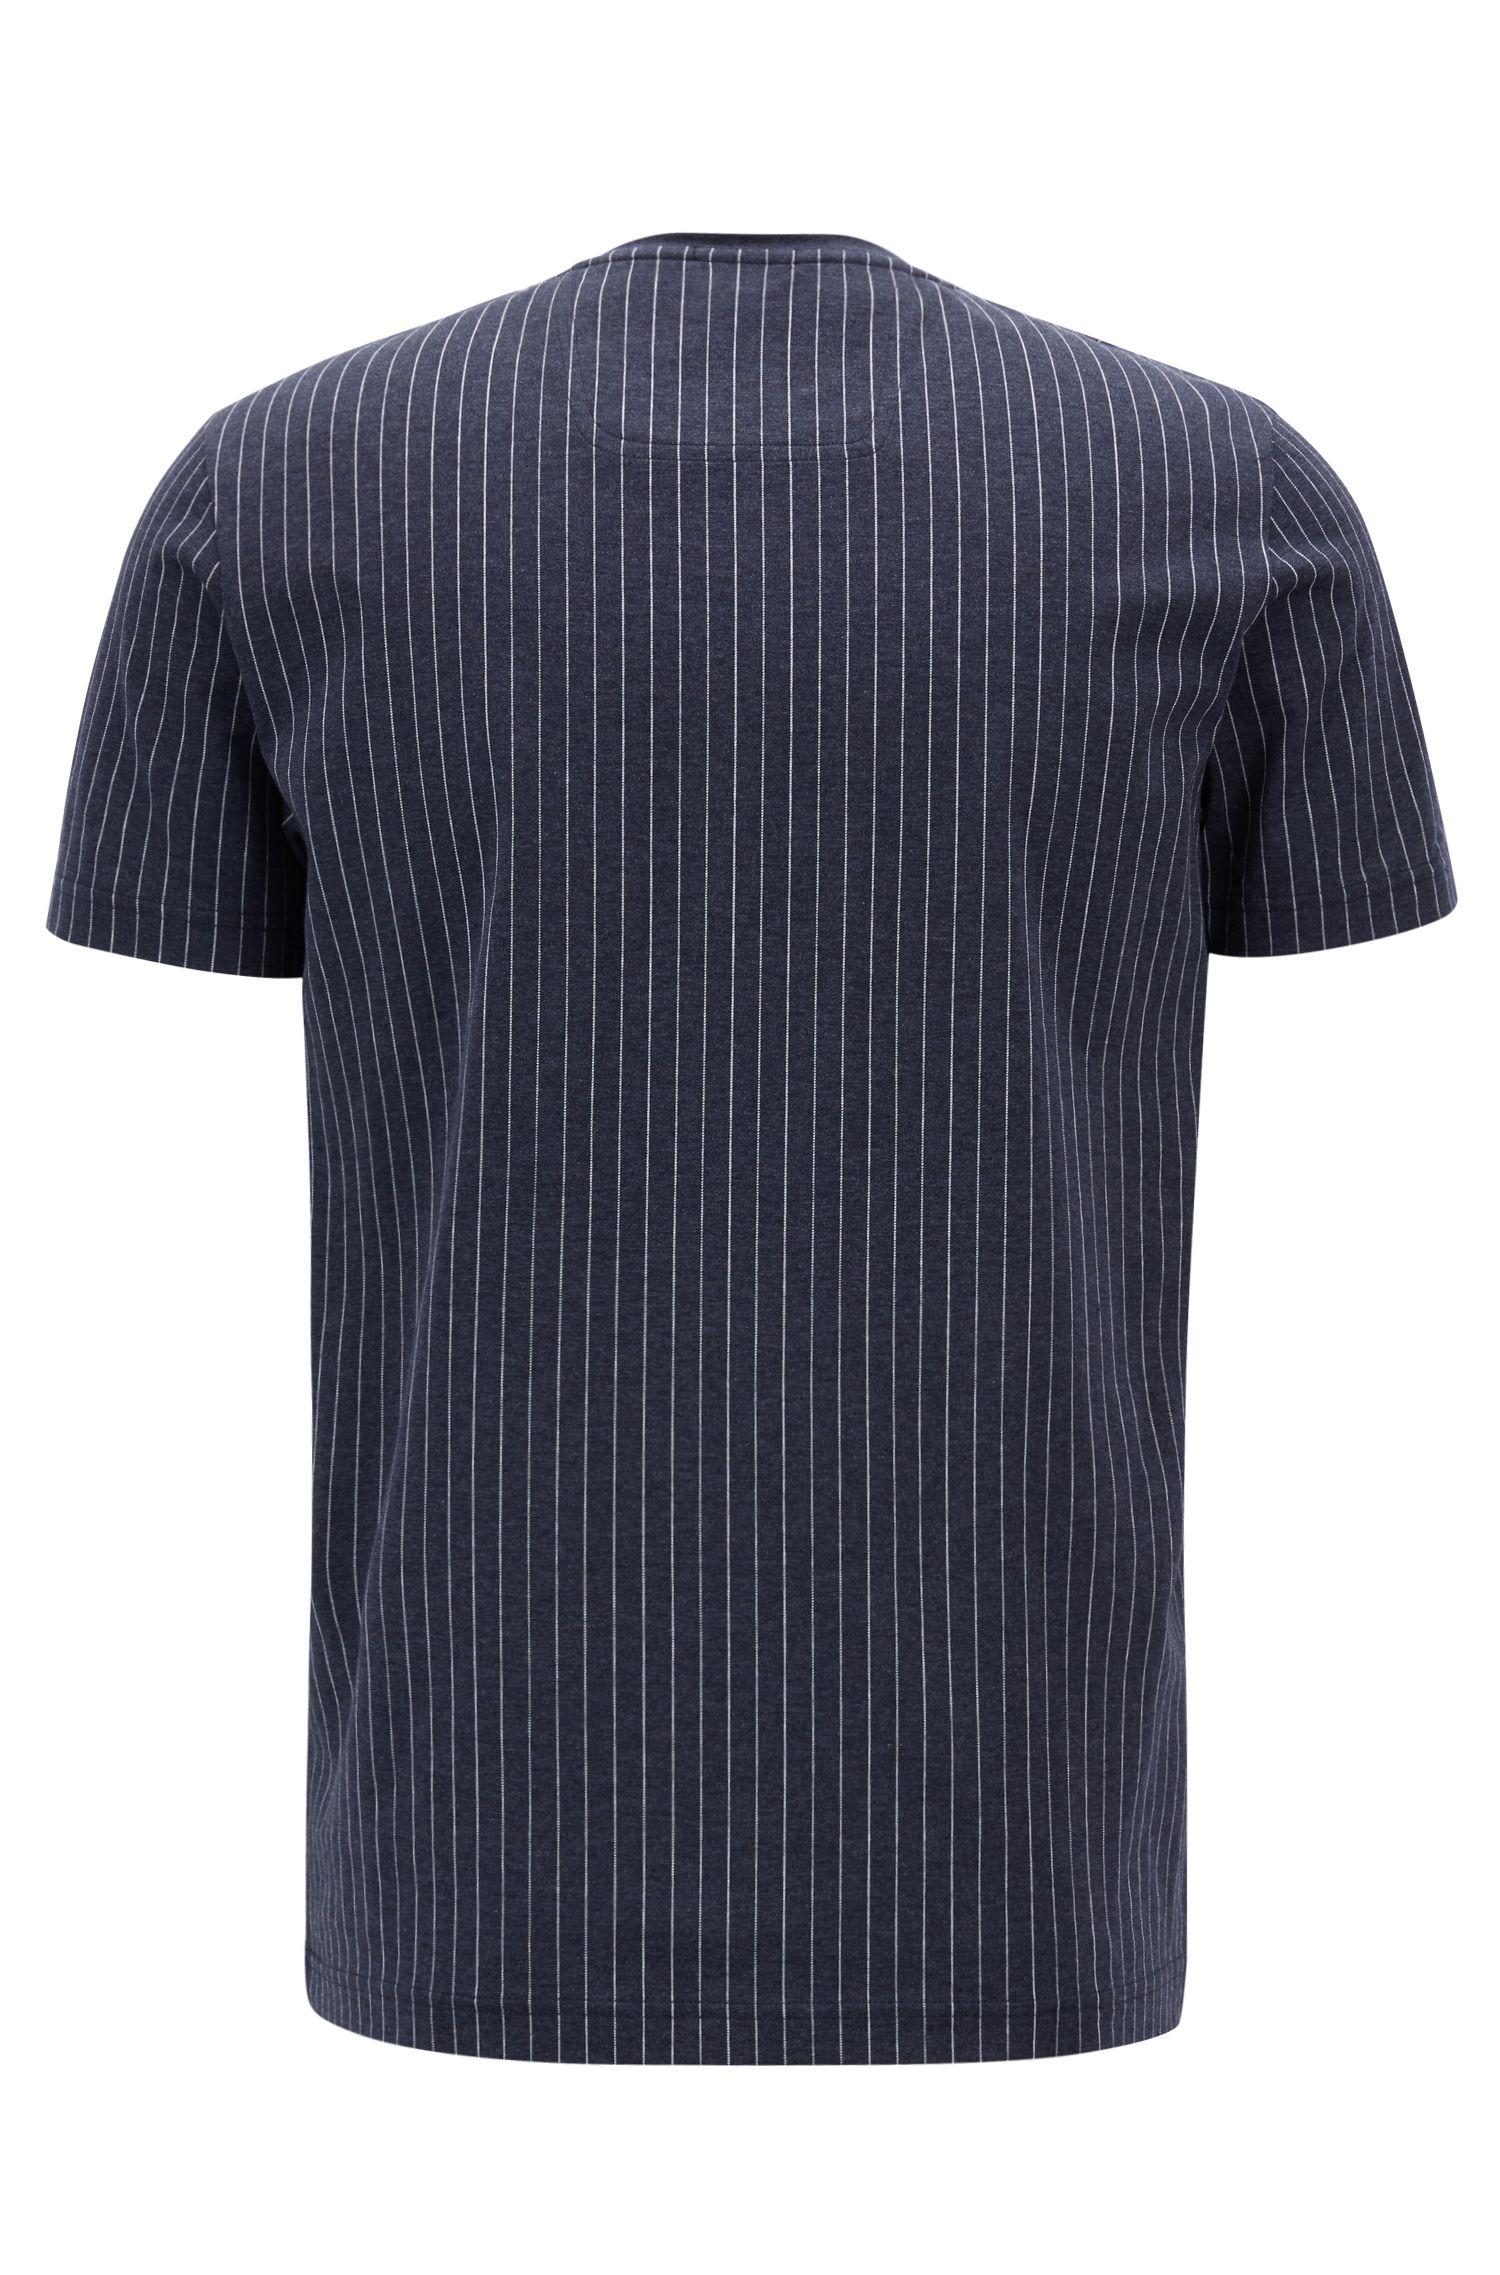 Pinstripe T-shirt in mercerized cotton with flock-print logo, Dark Blue